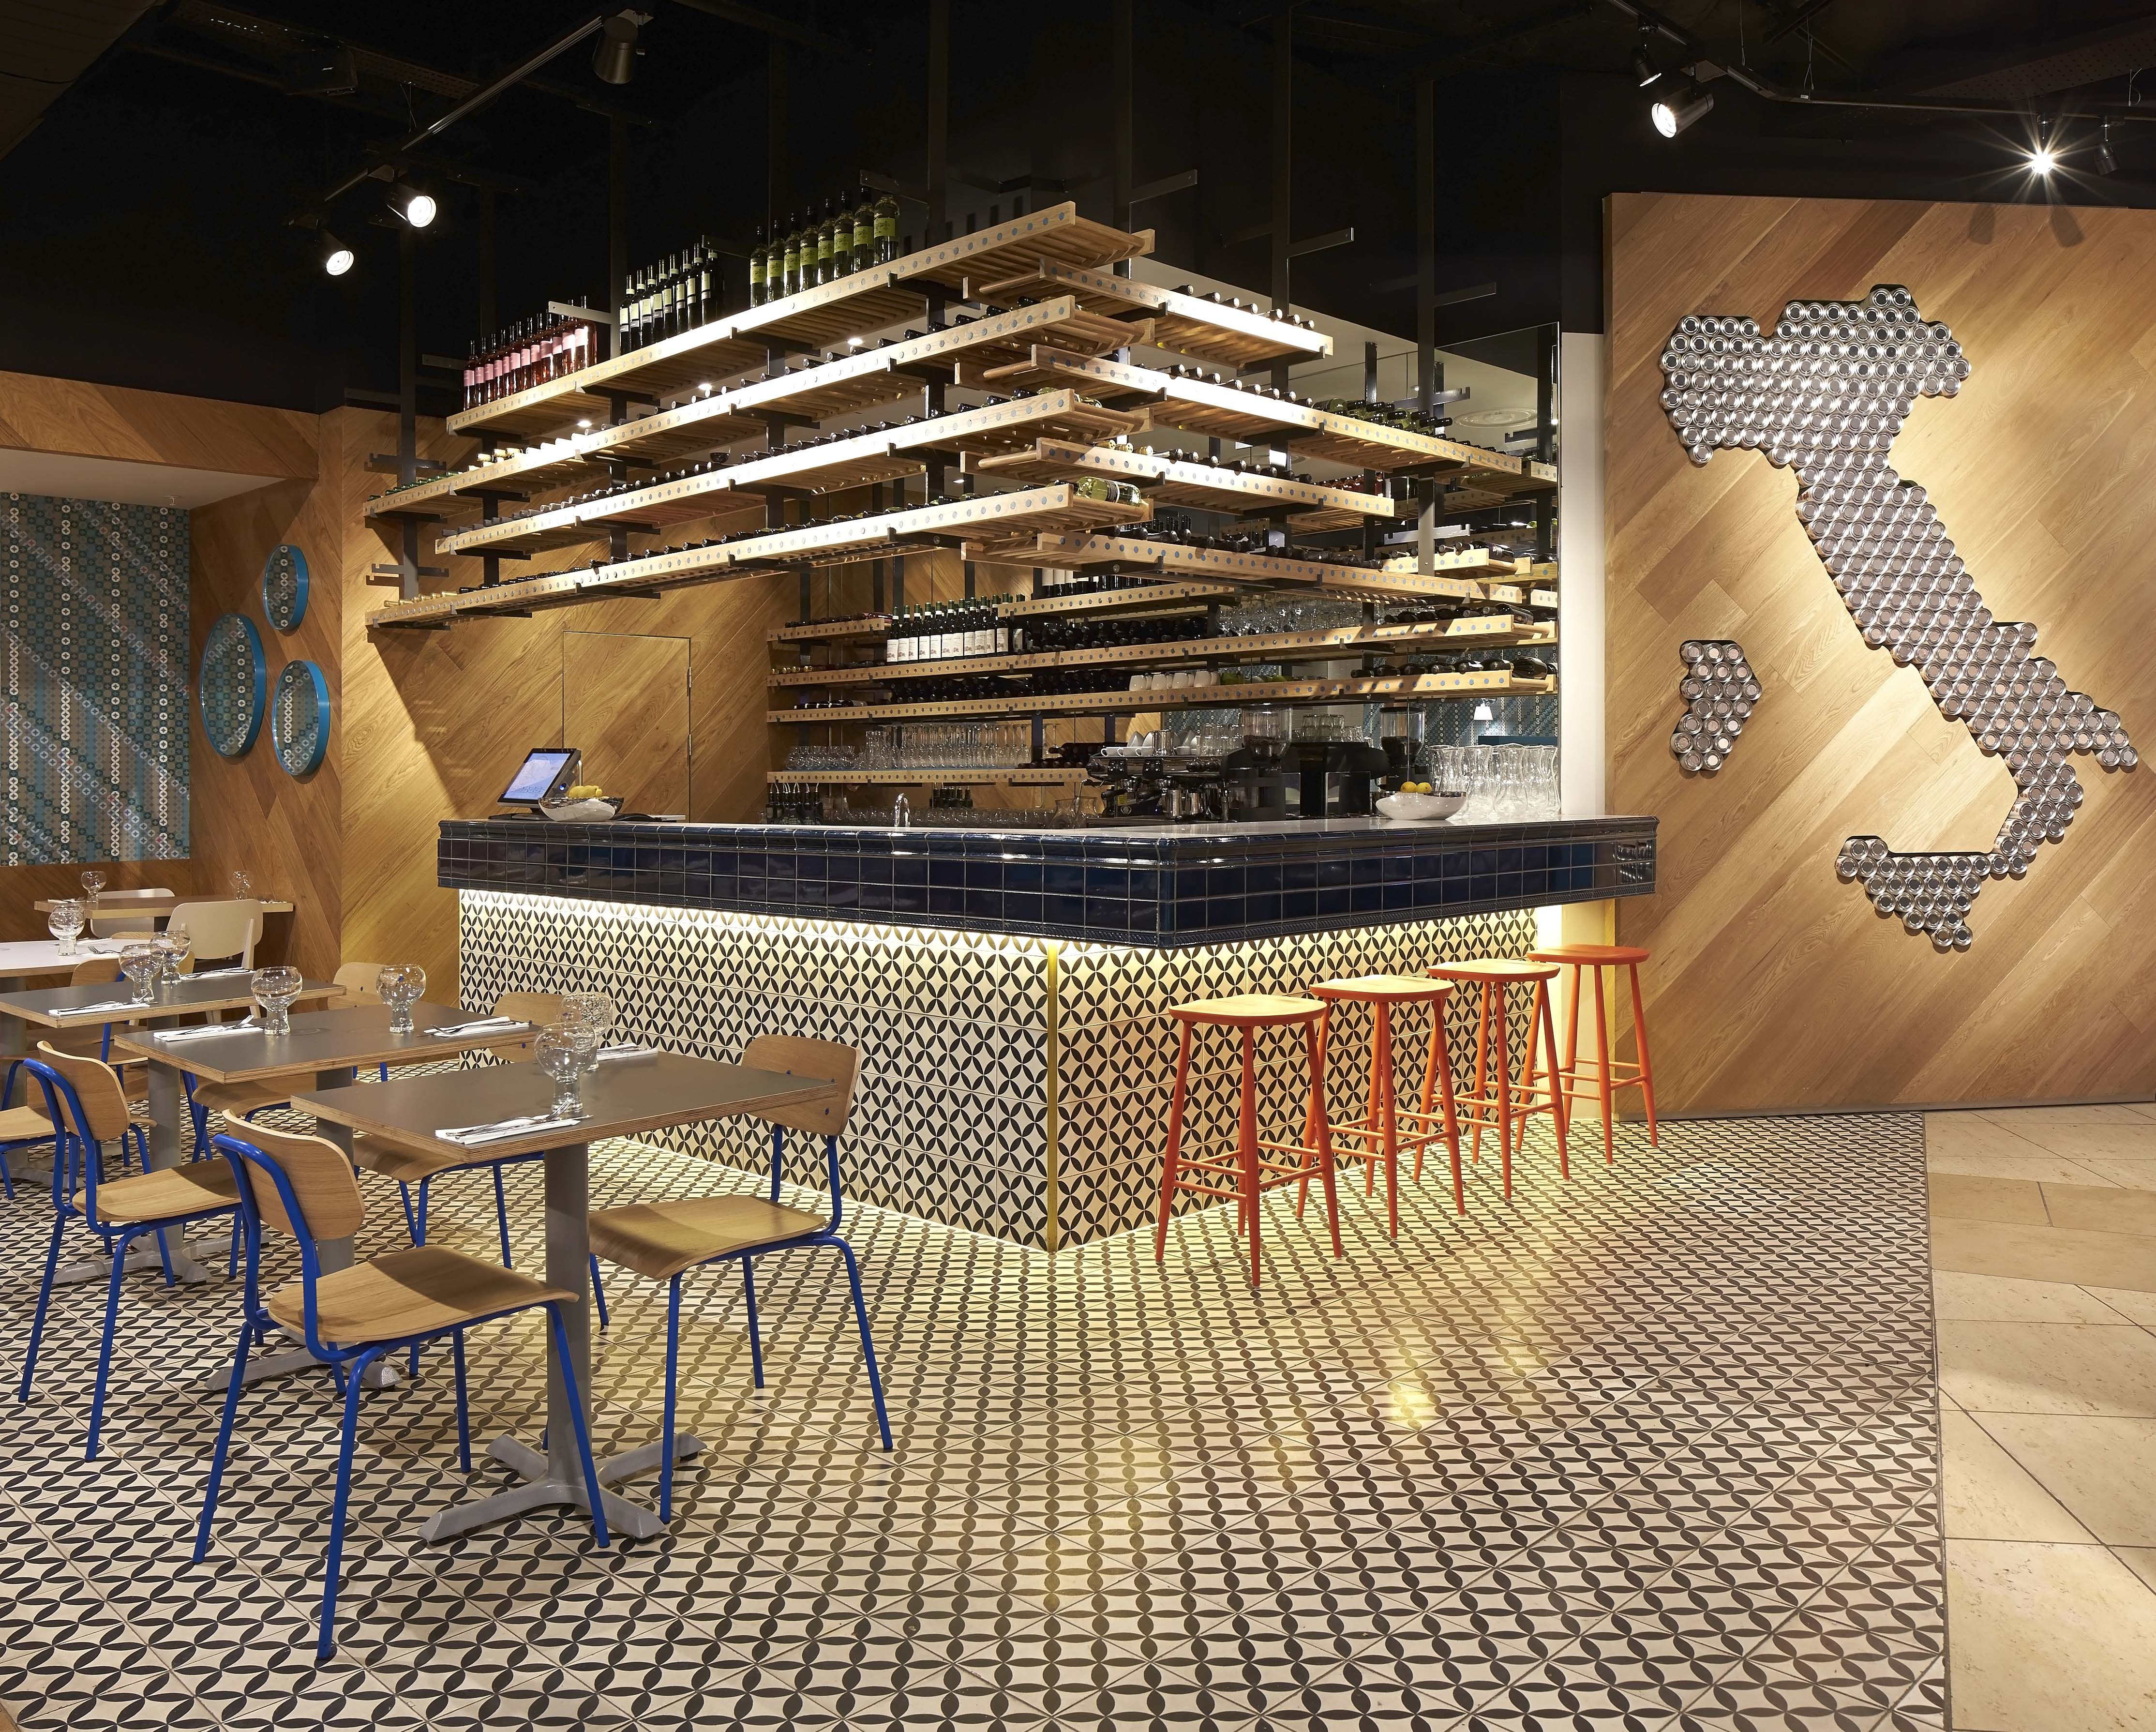 gundry & ducker ltd - bar tiling handmade tiles can be colour